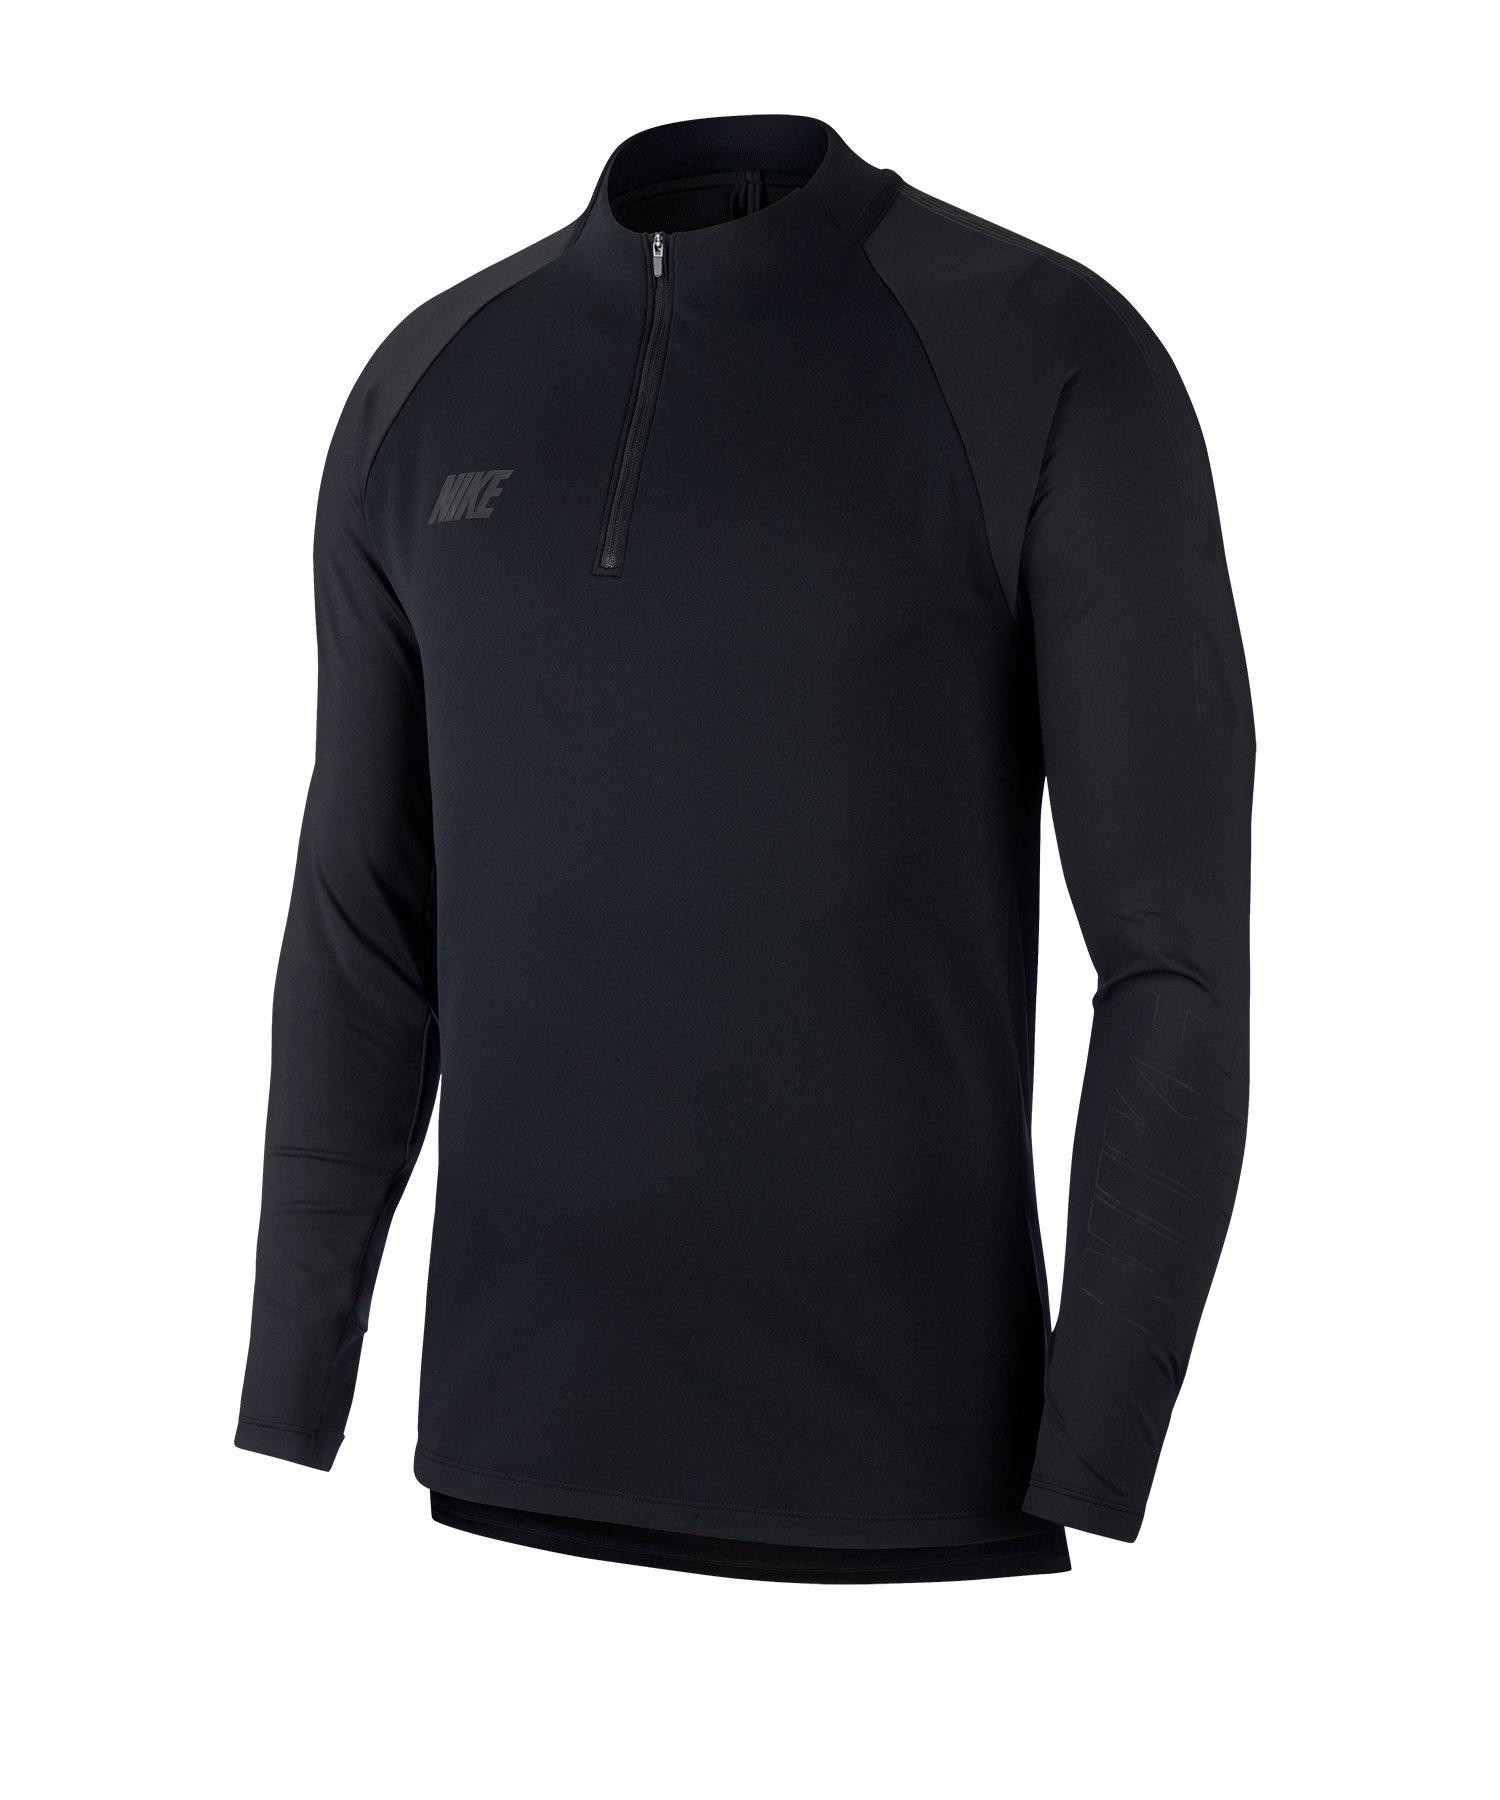 Nike Squad 19 Drill Top Sweatshirt Schwarz F013 - schwarz